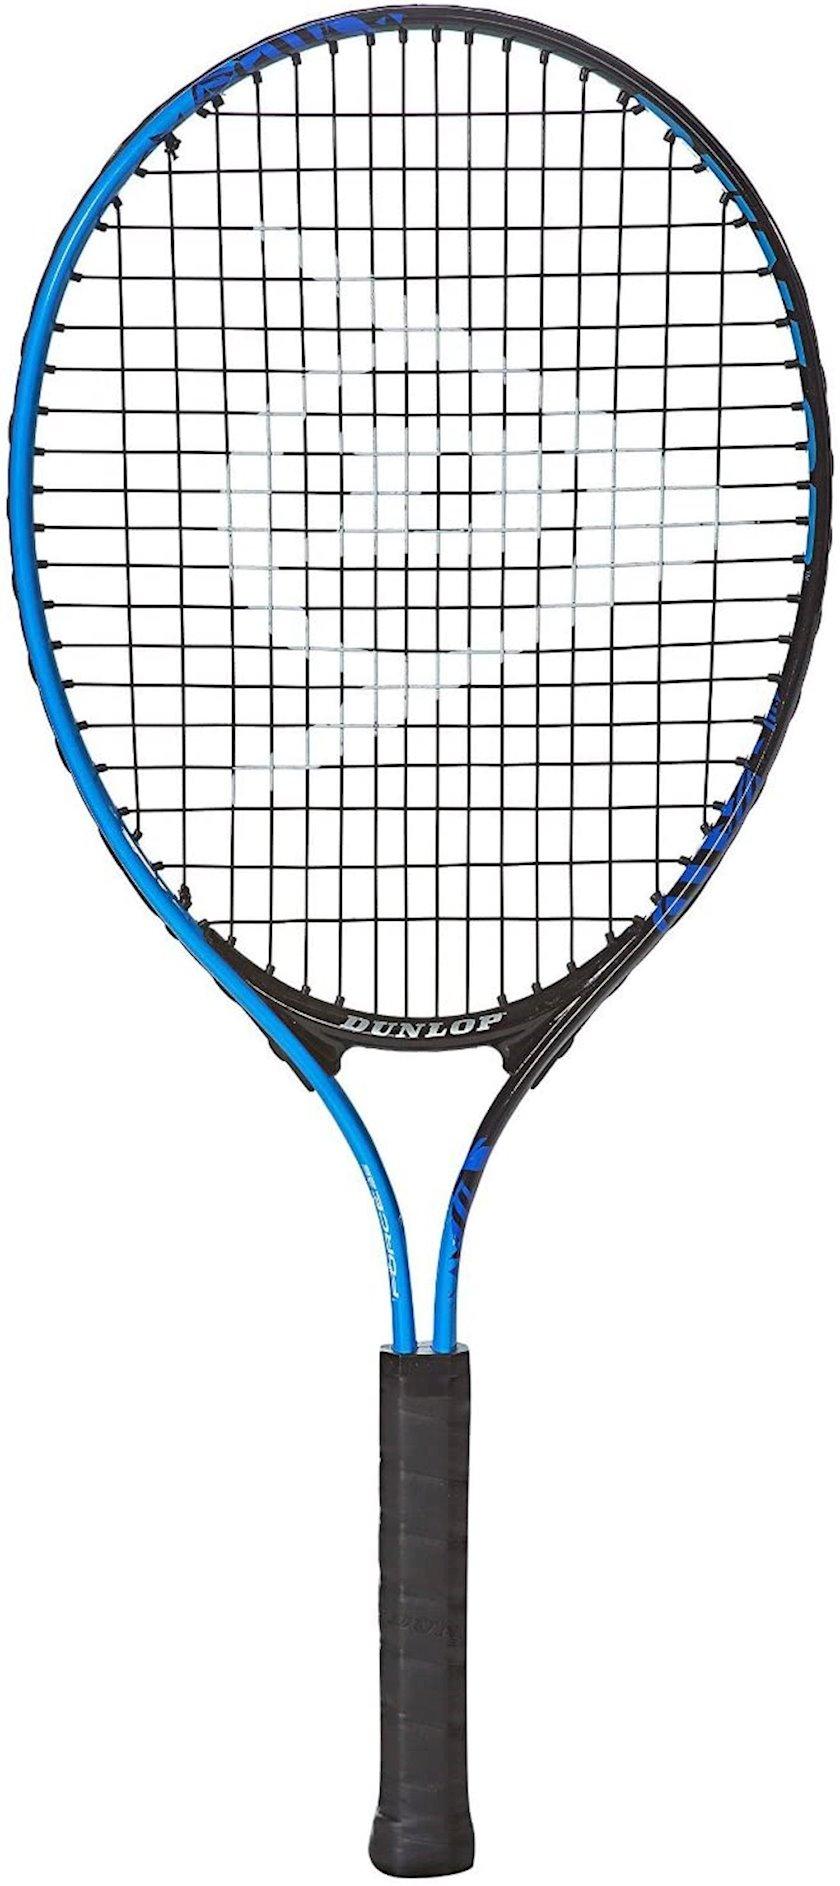 Böyük tennis üçün tennis raketkası Dunlop Force Team 26, uniseks, alüminium, göy/qırmızı, 265 q